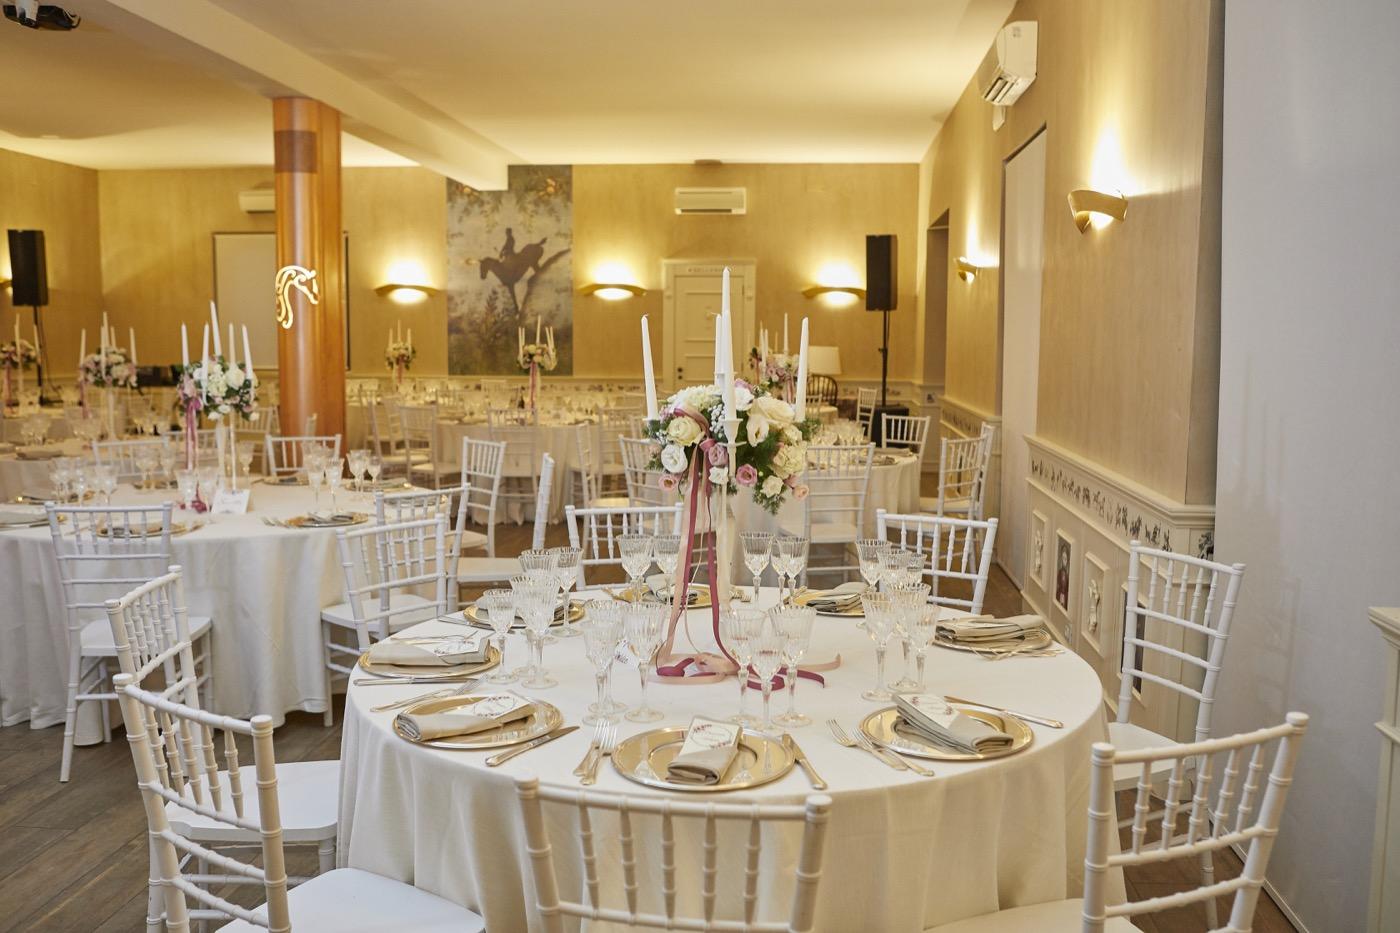 Claudio-Coppola-wedding-photographer-la-scuderia-eventi-preparativi-la-rosetta-perugia-81